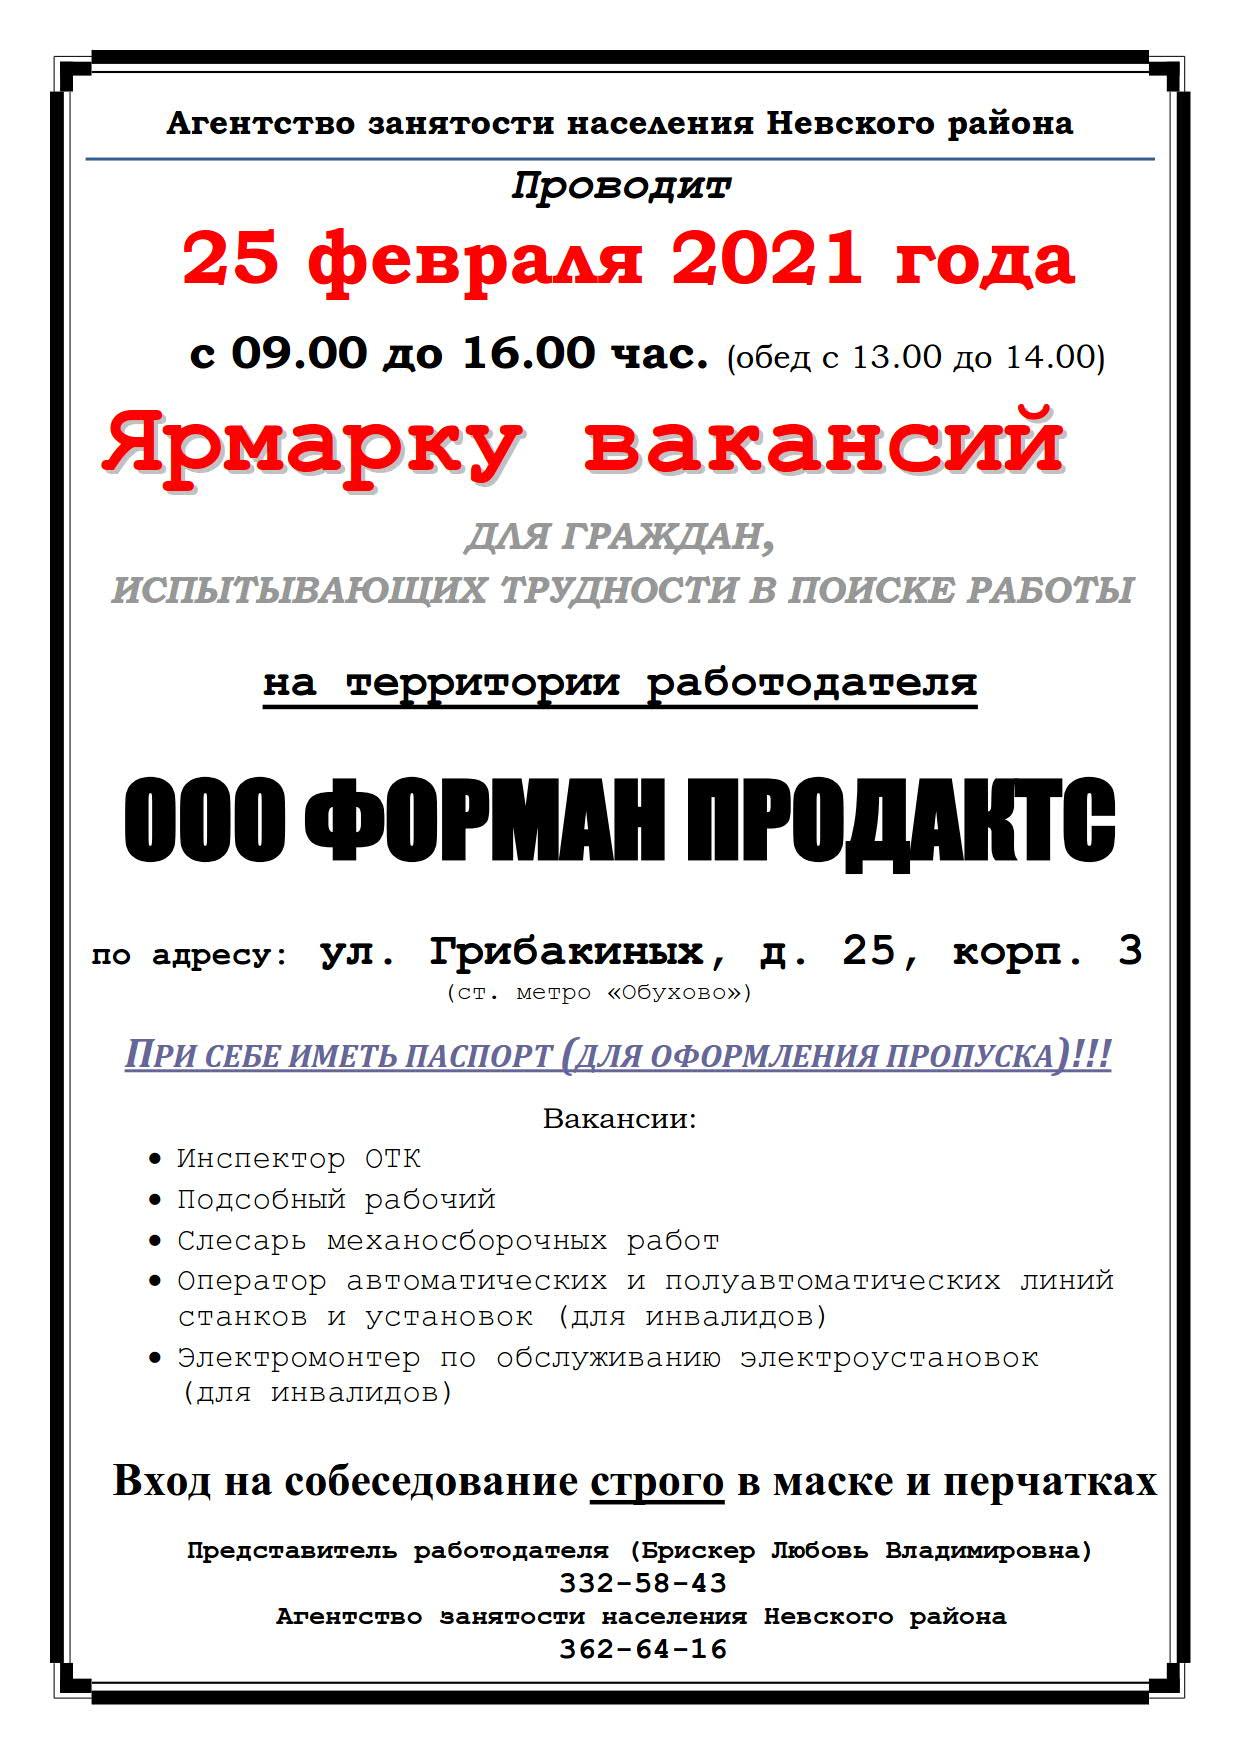 объявление ЯВ, 25.02.2021_1